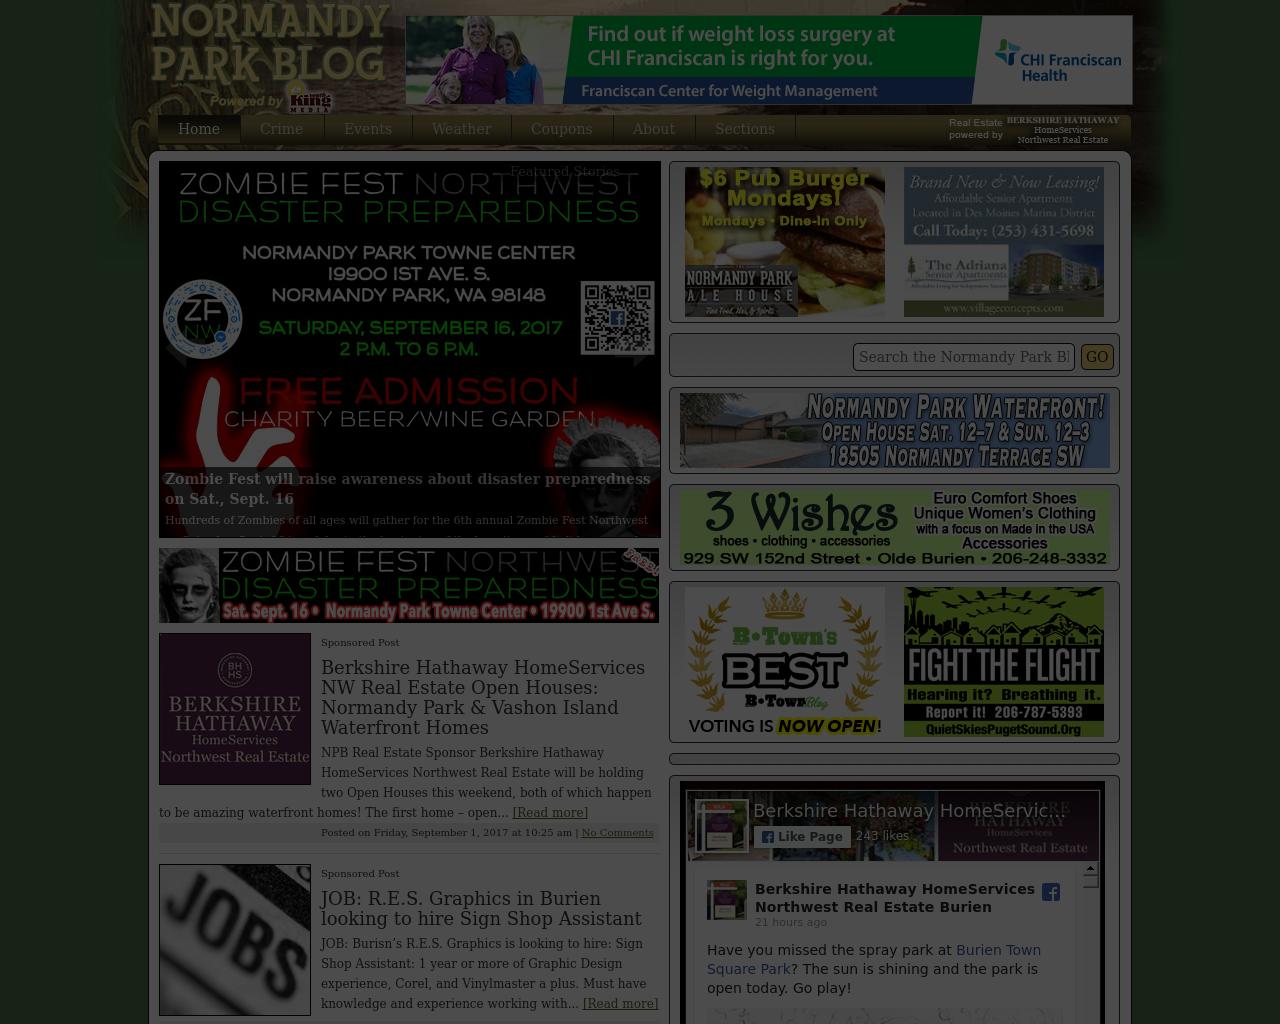 Normandy-Park-Blog-Advertising-Reviews-Pricing